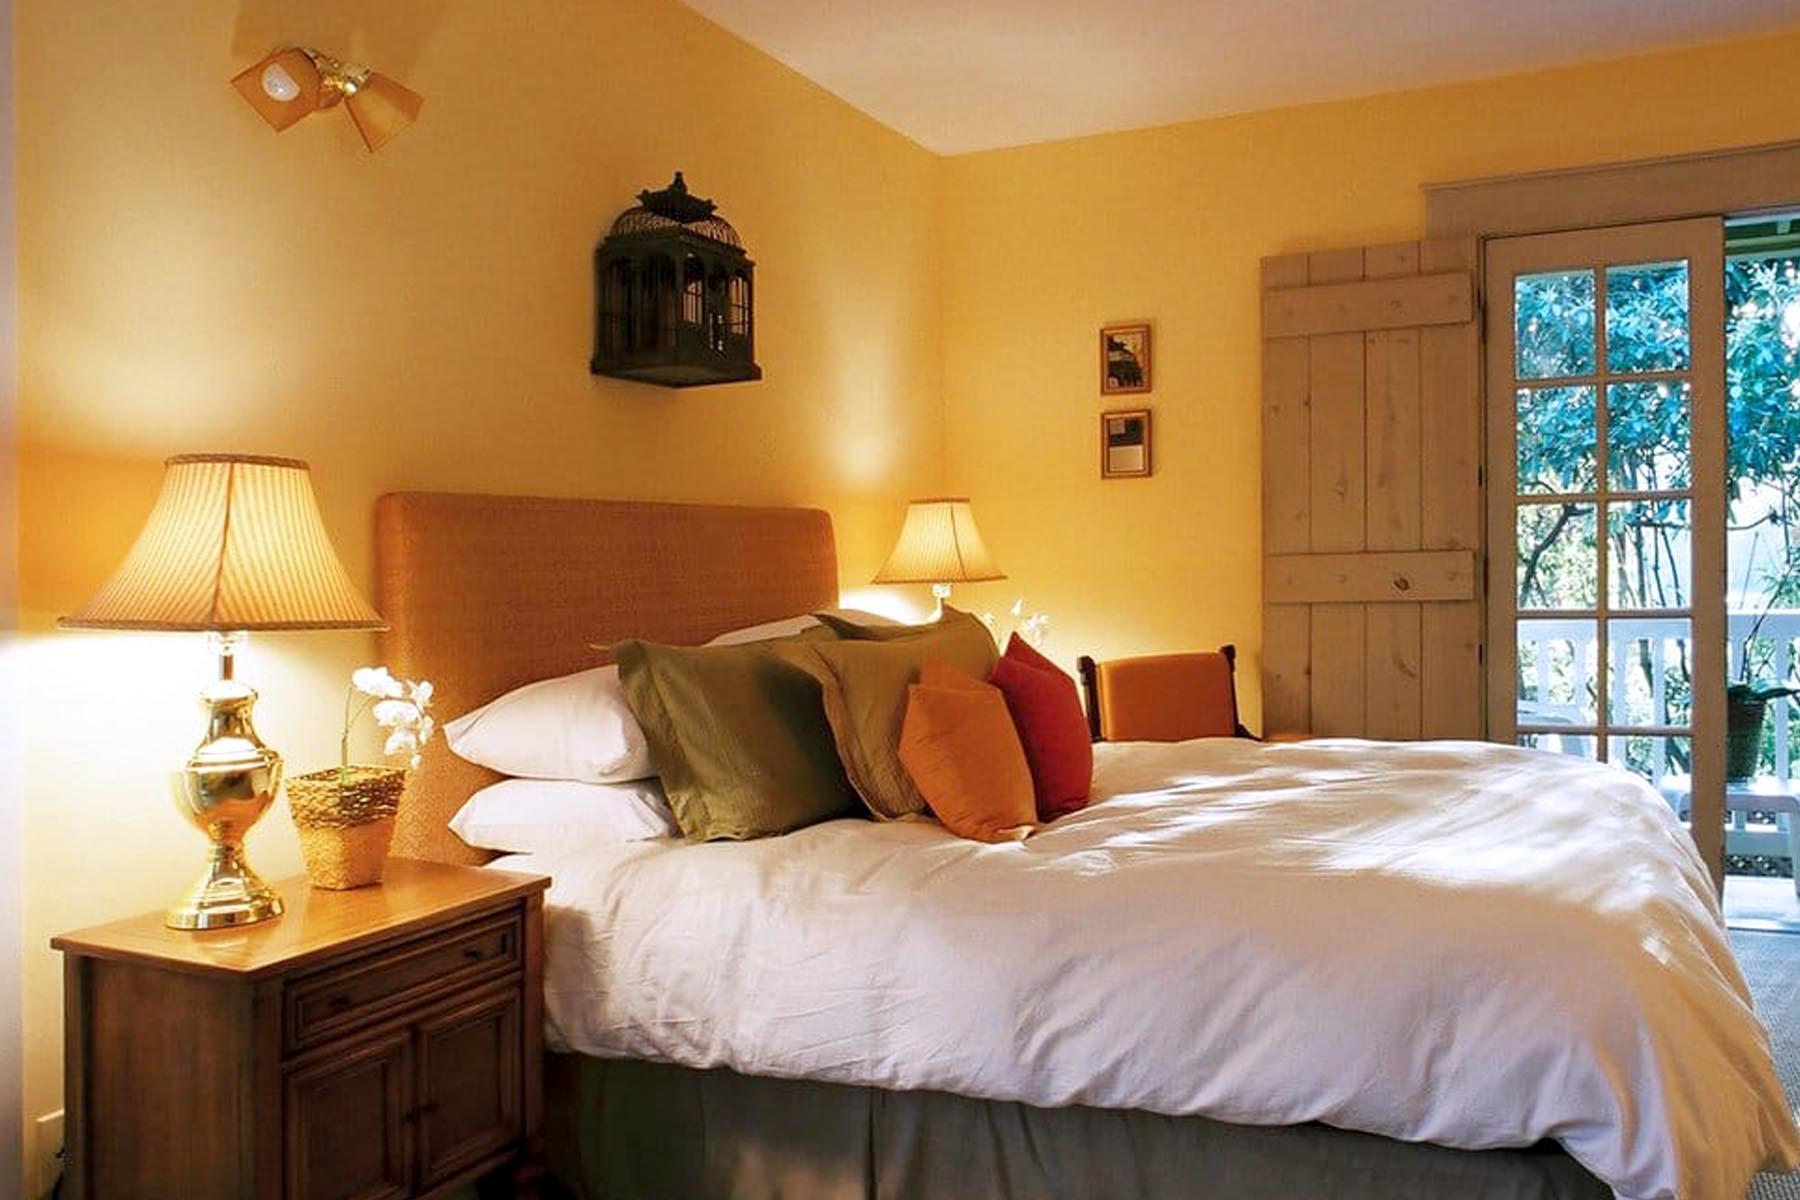 THE ORCHID INN bedroom